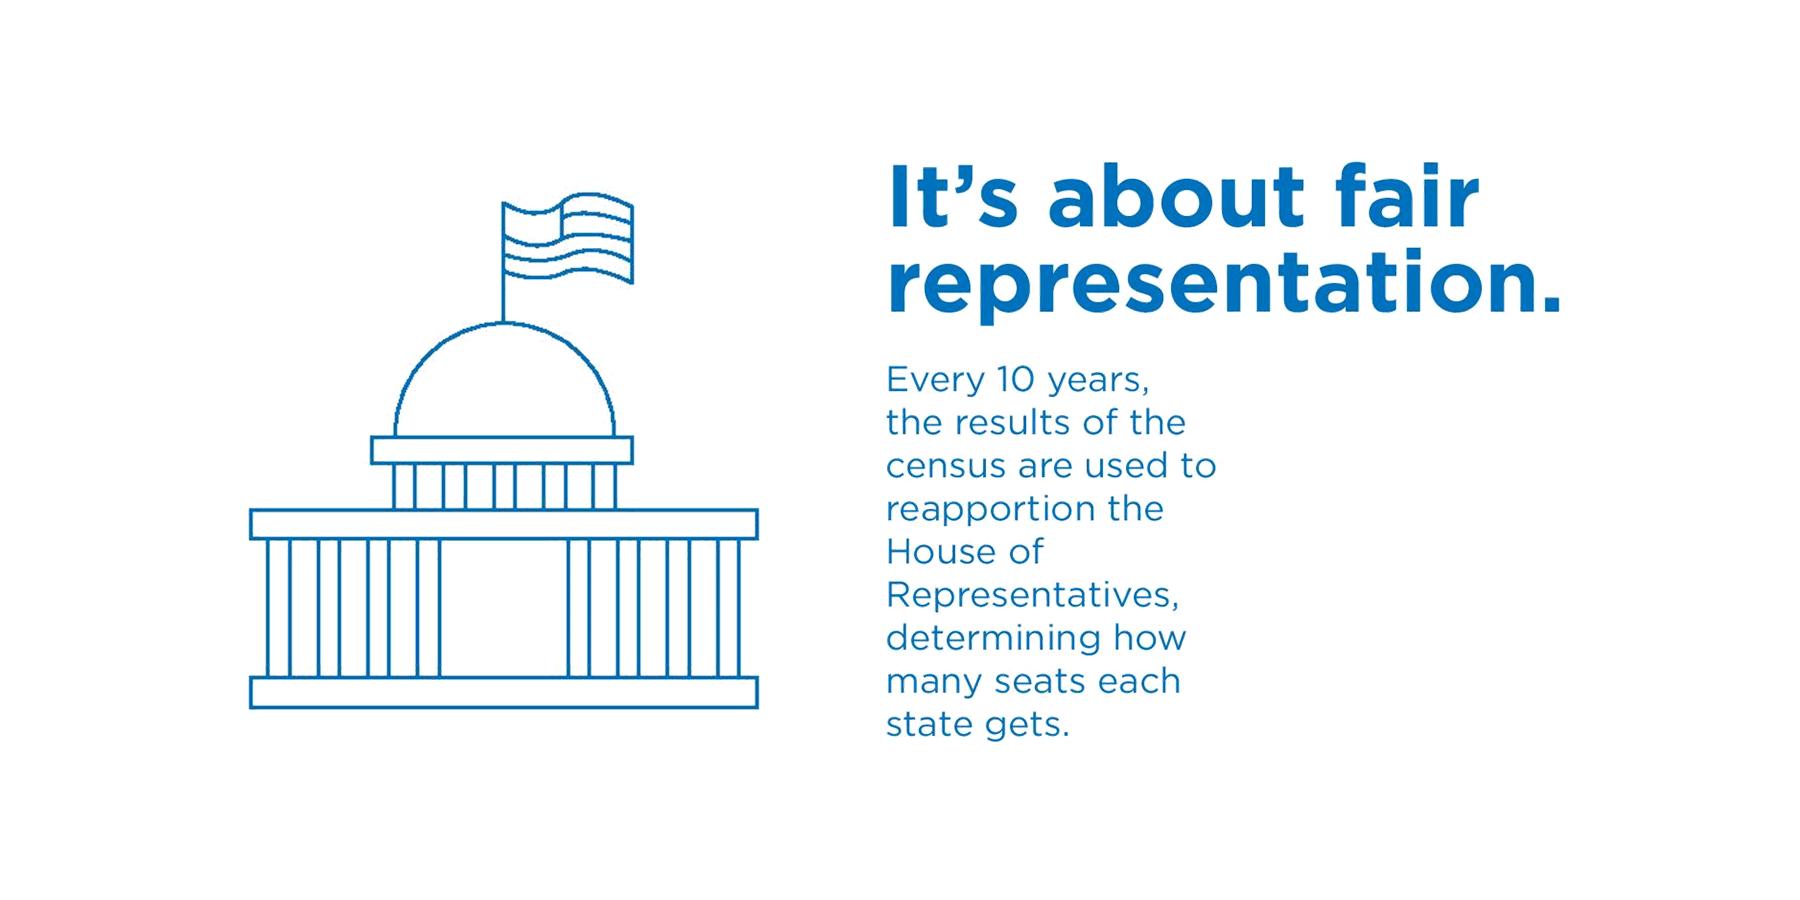 It's about fair representation